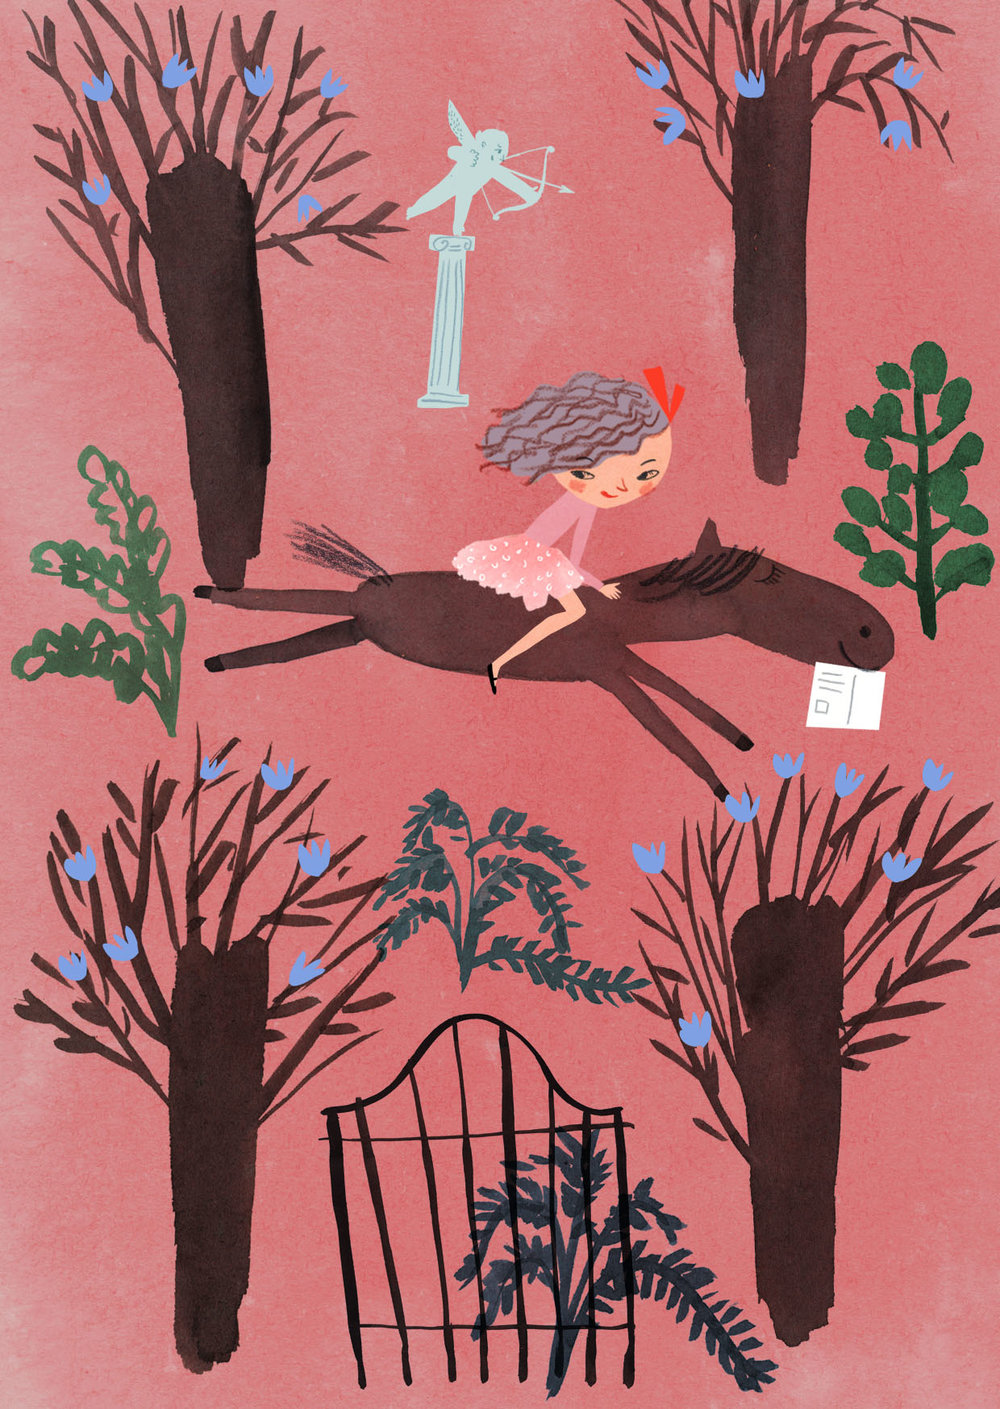 PEGASOS in a park,postcard for Kehvola (2015)